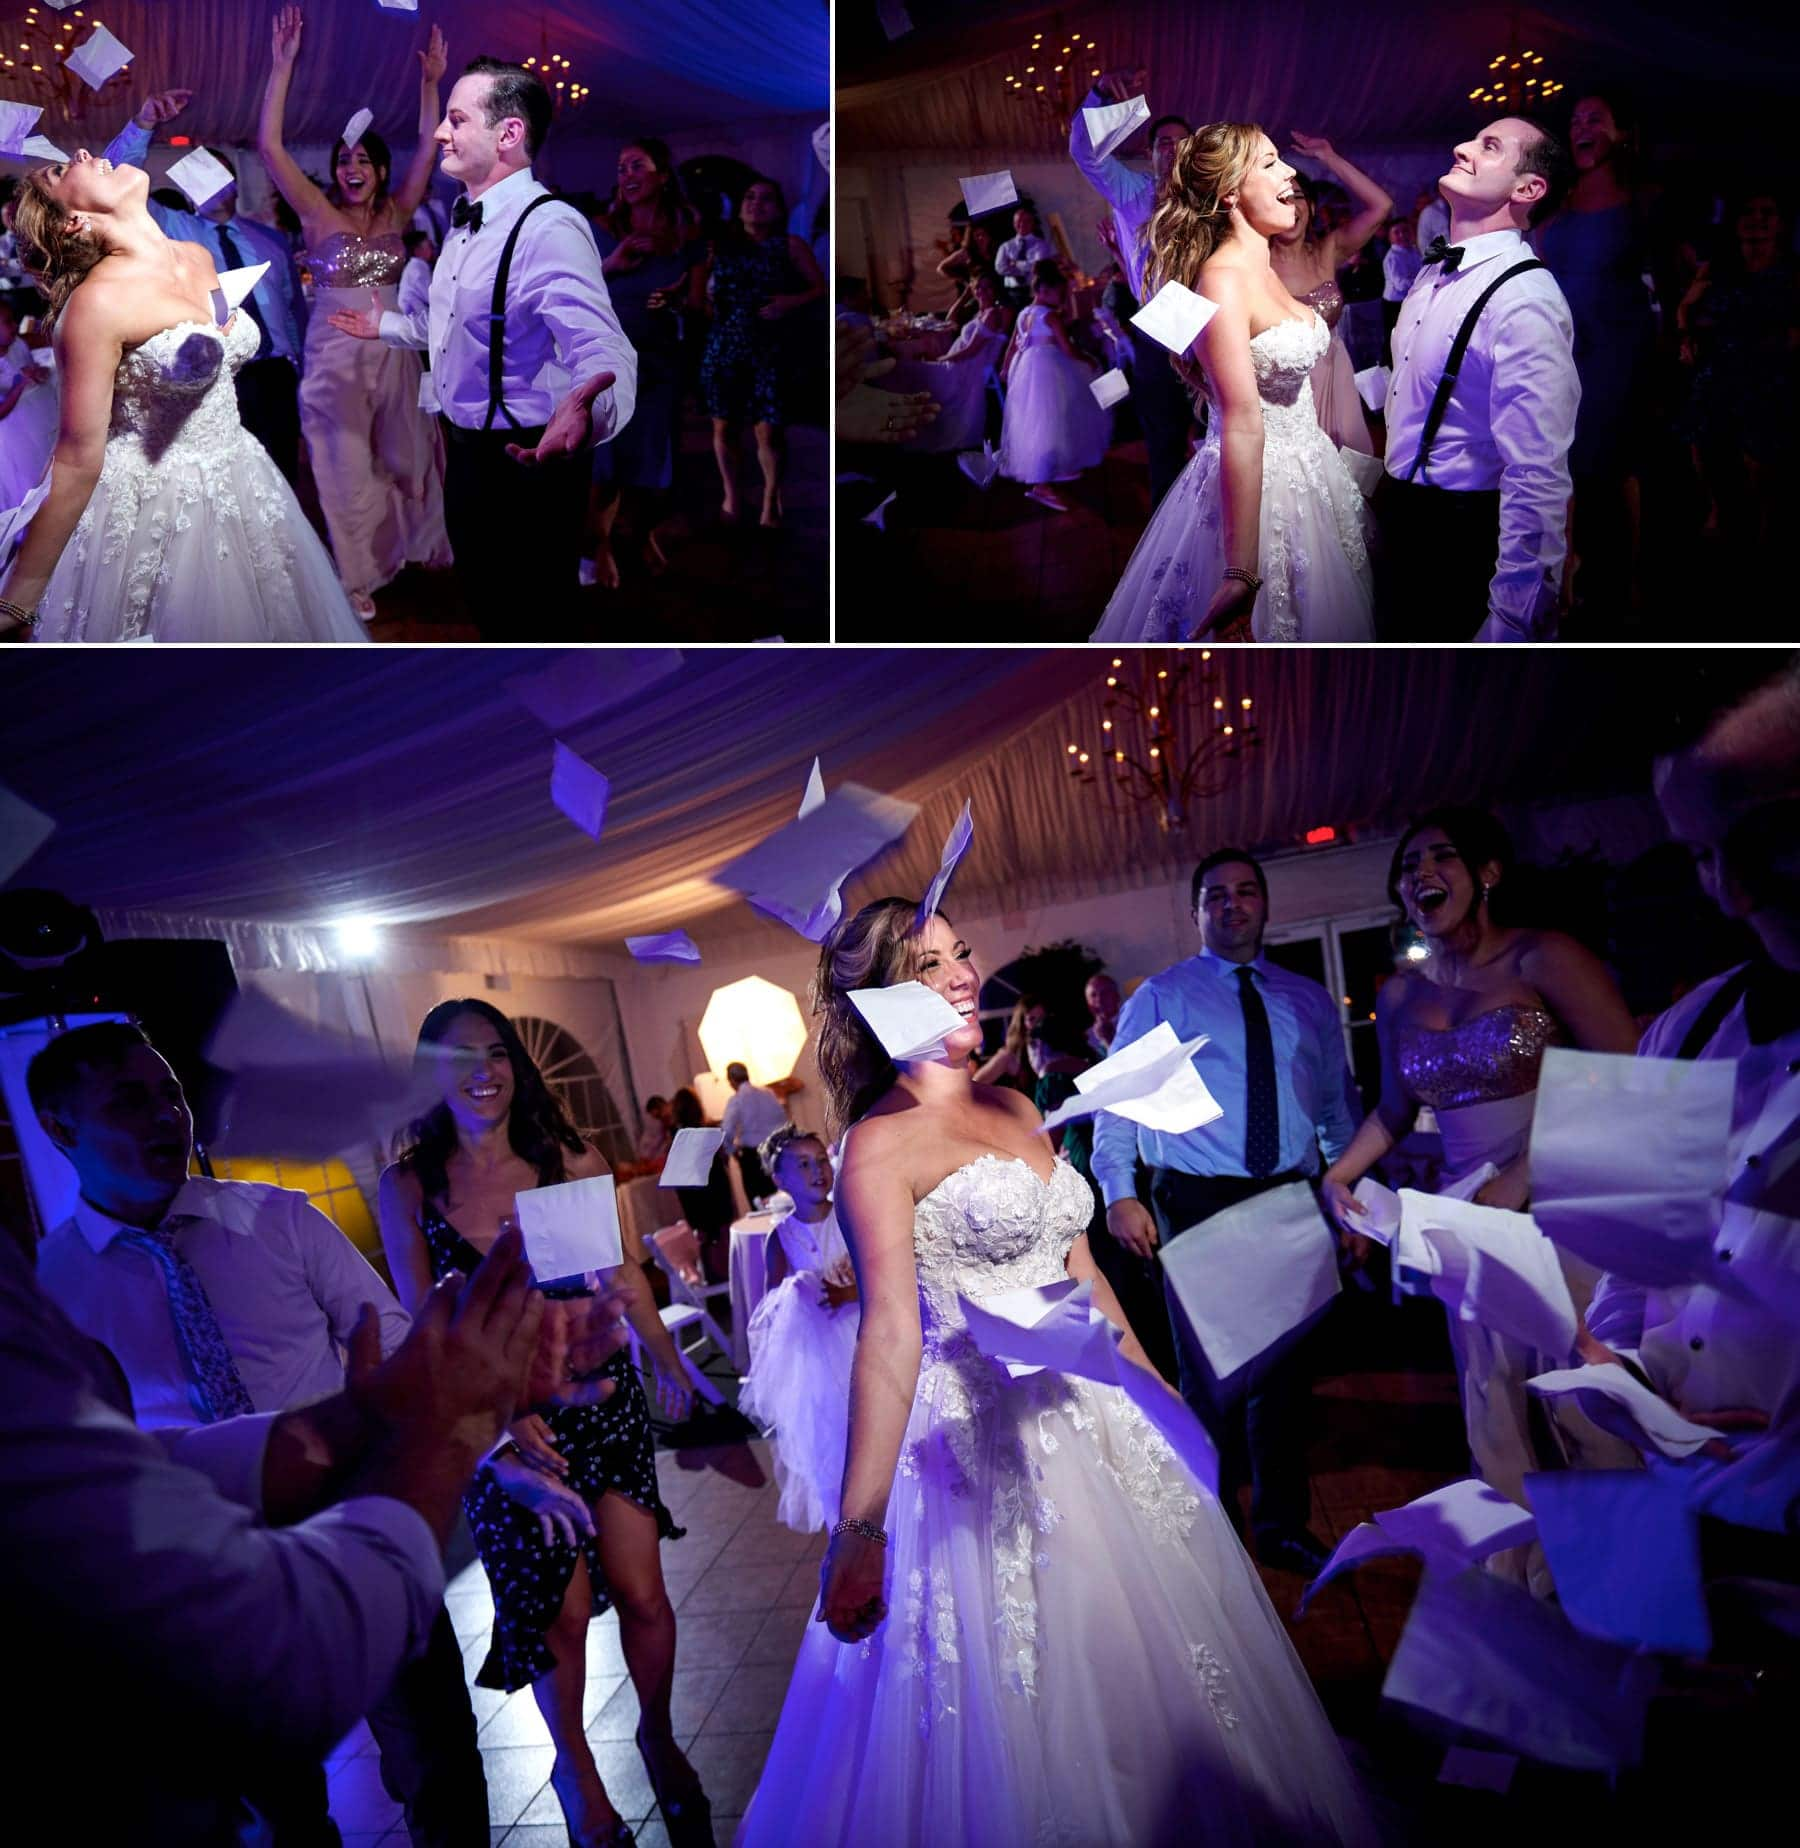 wedding reception photos at Royce Brook Golf Club